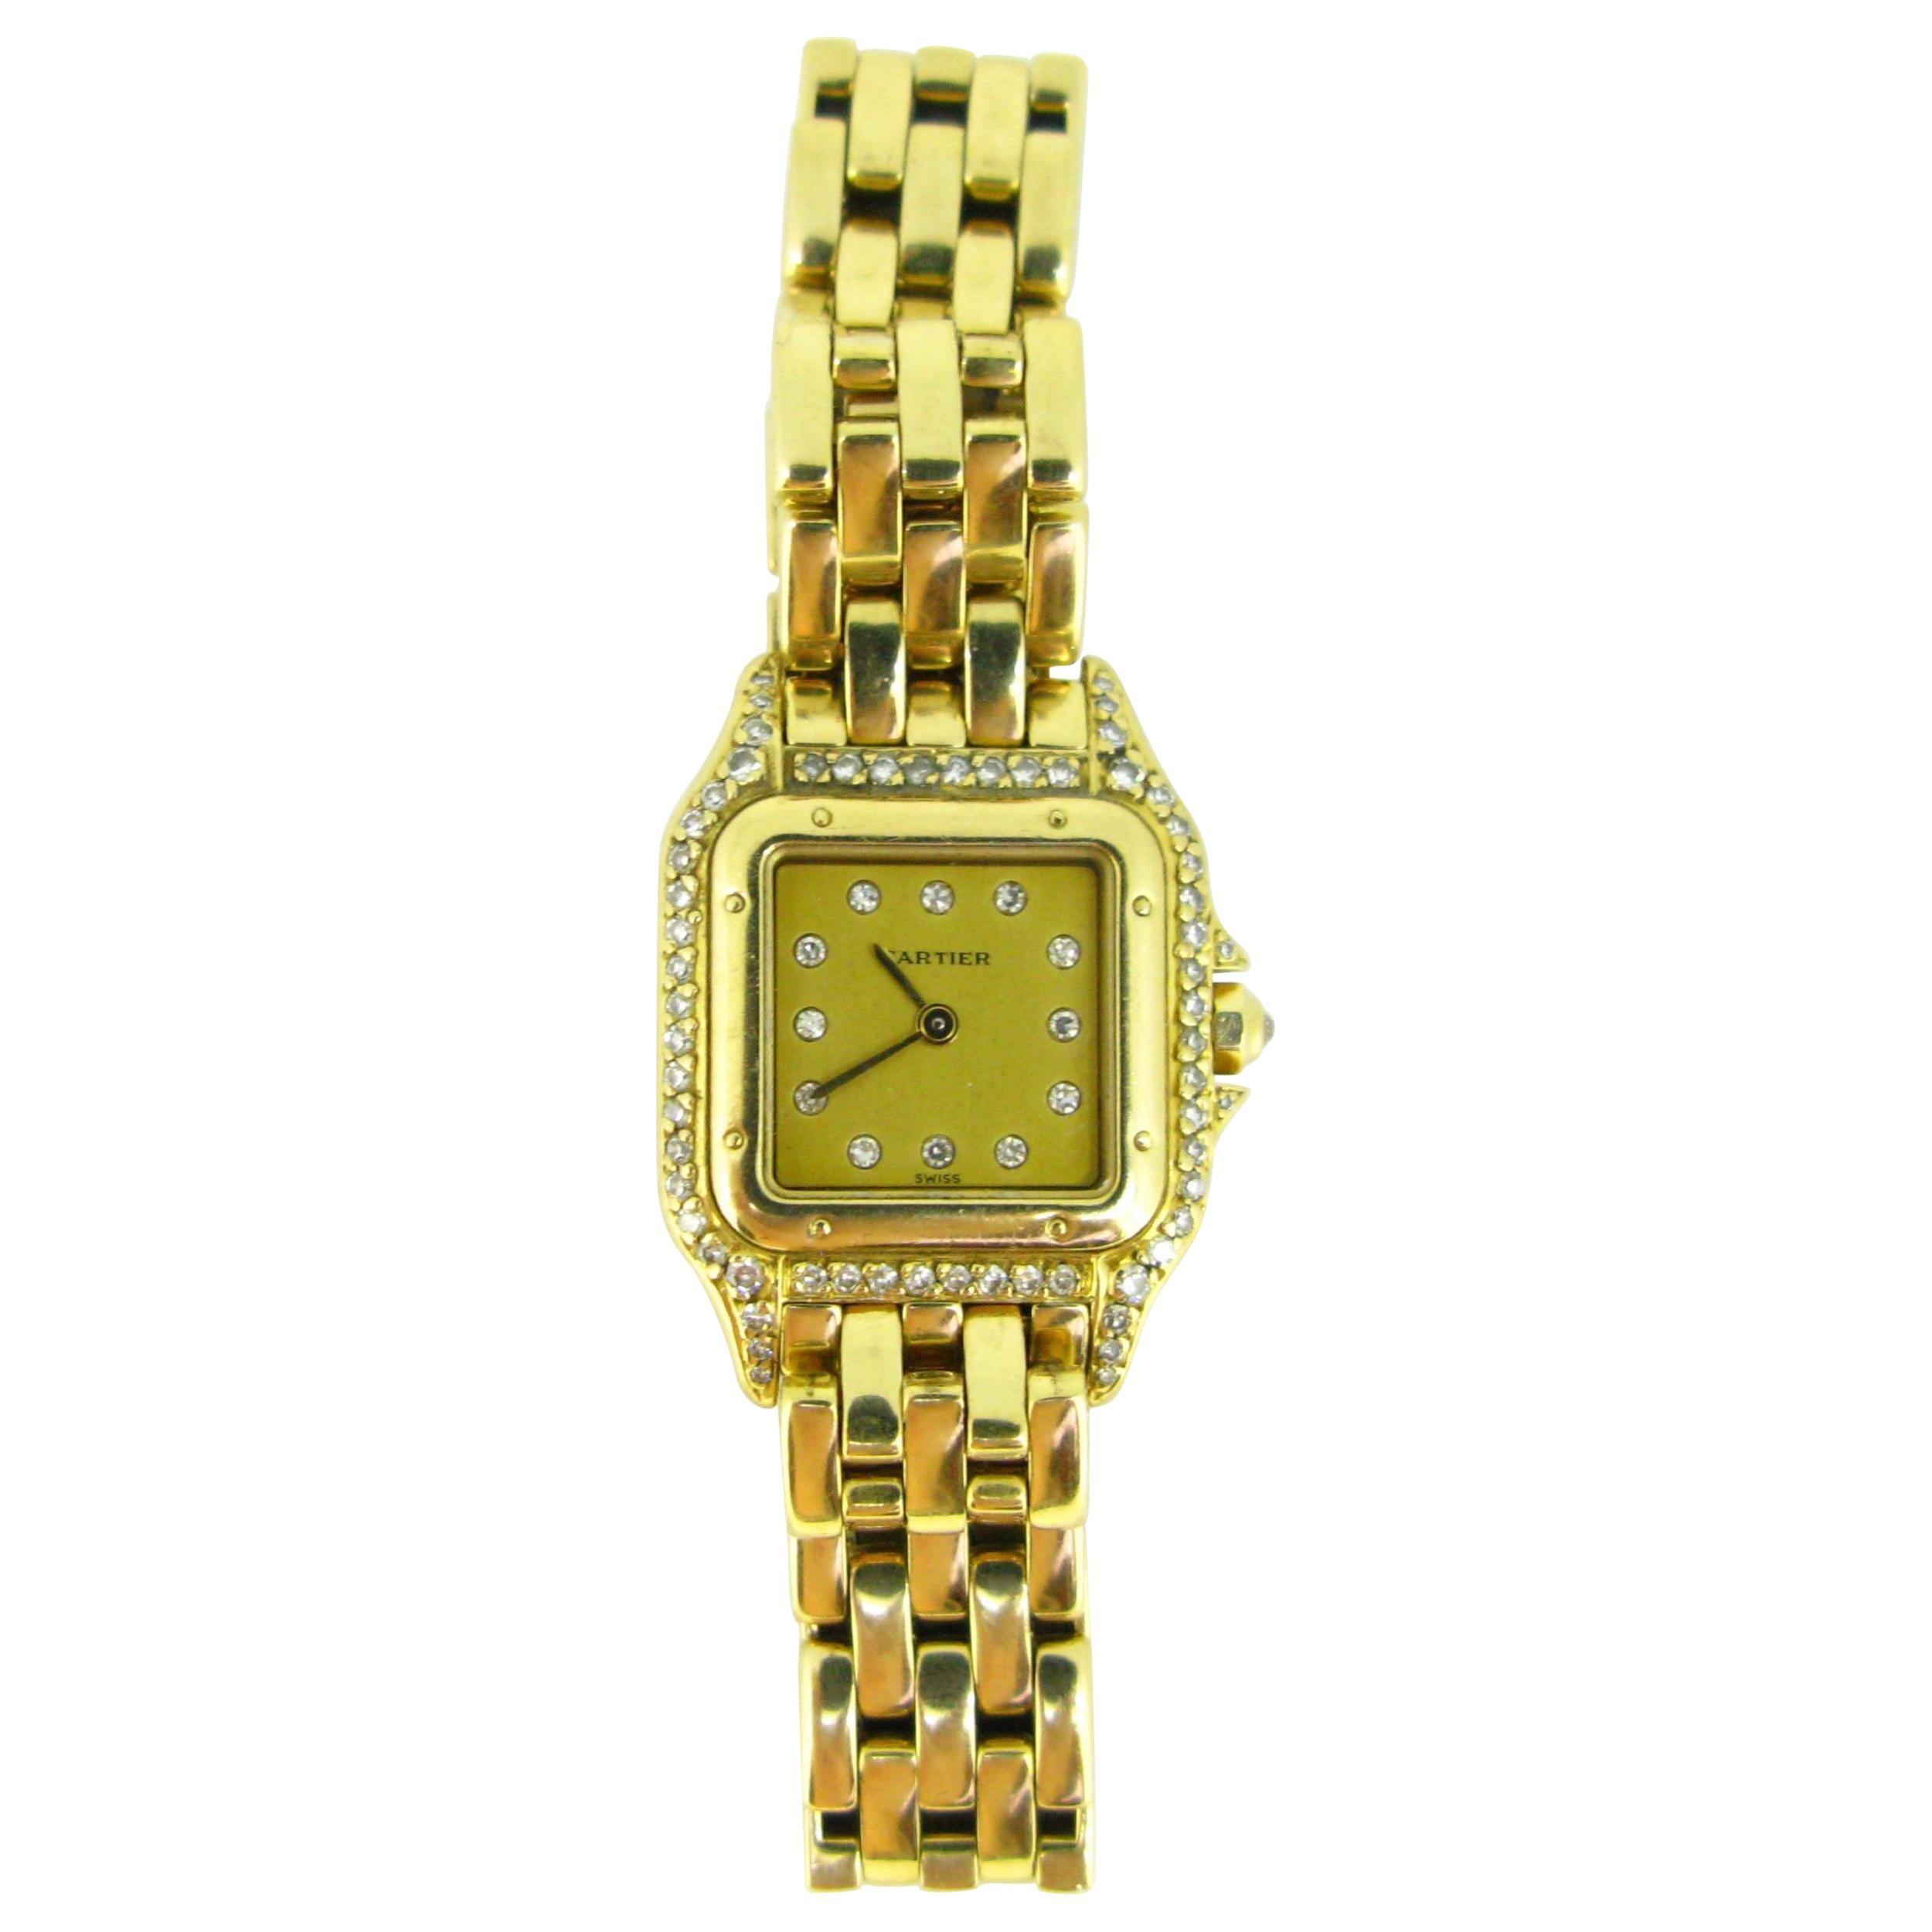 Cartier Panthere Diamonds Small Model Yellow Gold Watch